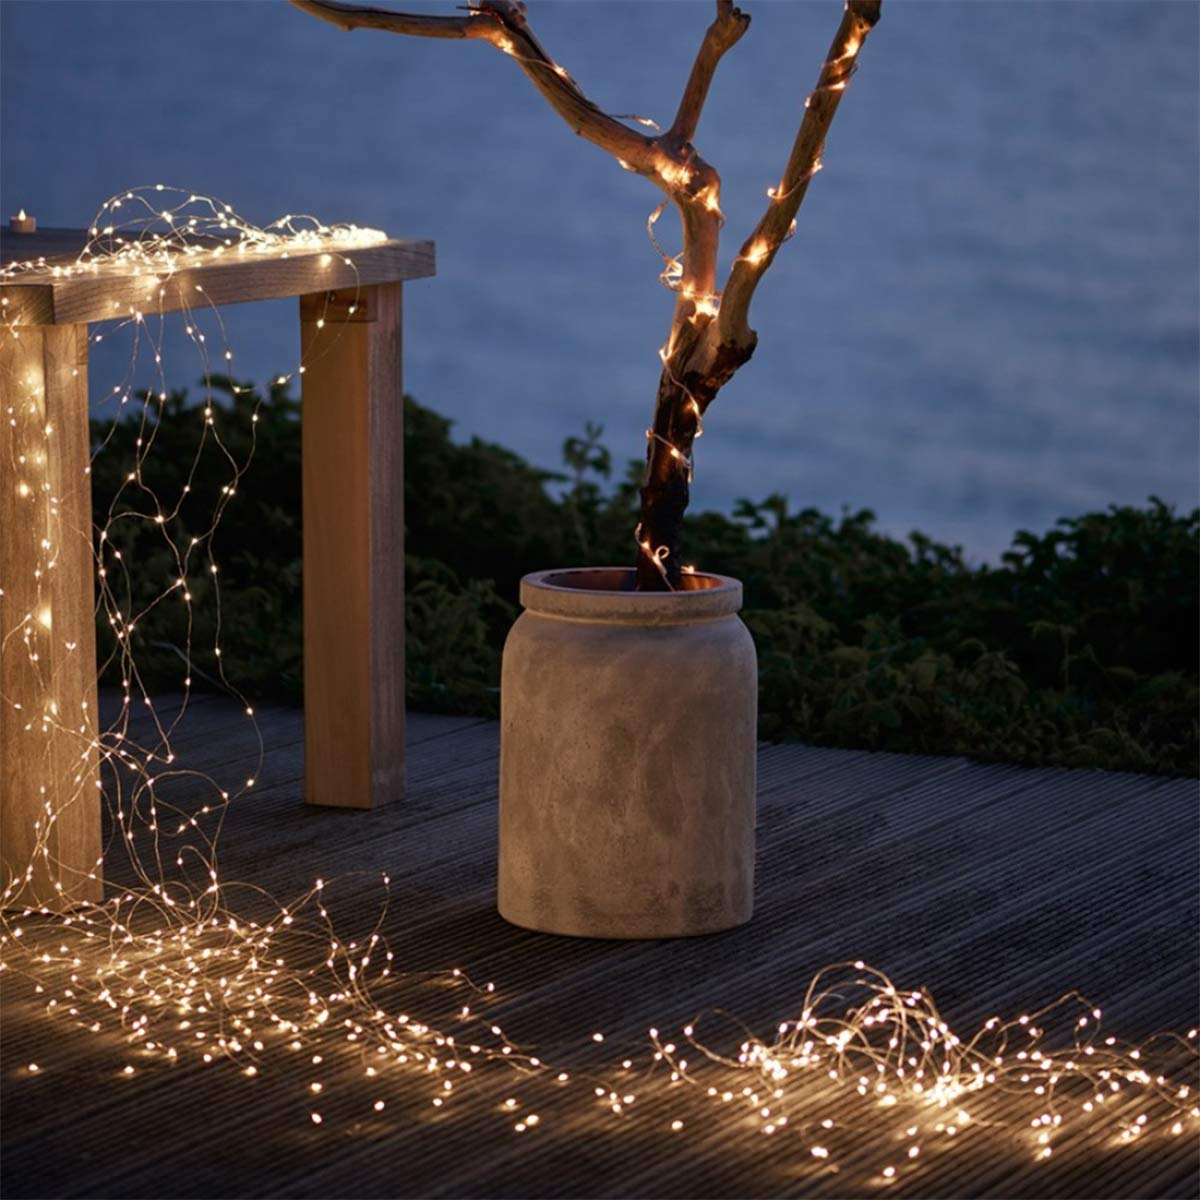 Weihnachtsbeleuchtung Akku.Lichterkette 200 Leds Greempire 2pcs Warmweiß Kupferdraht Silber